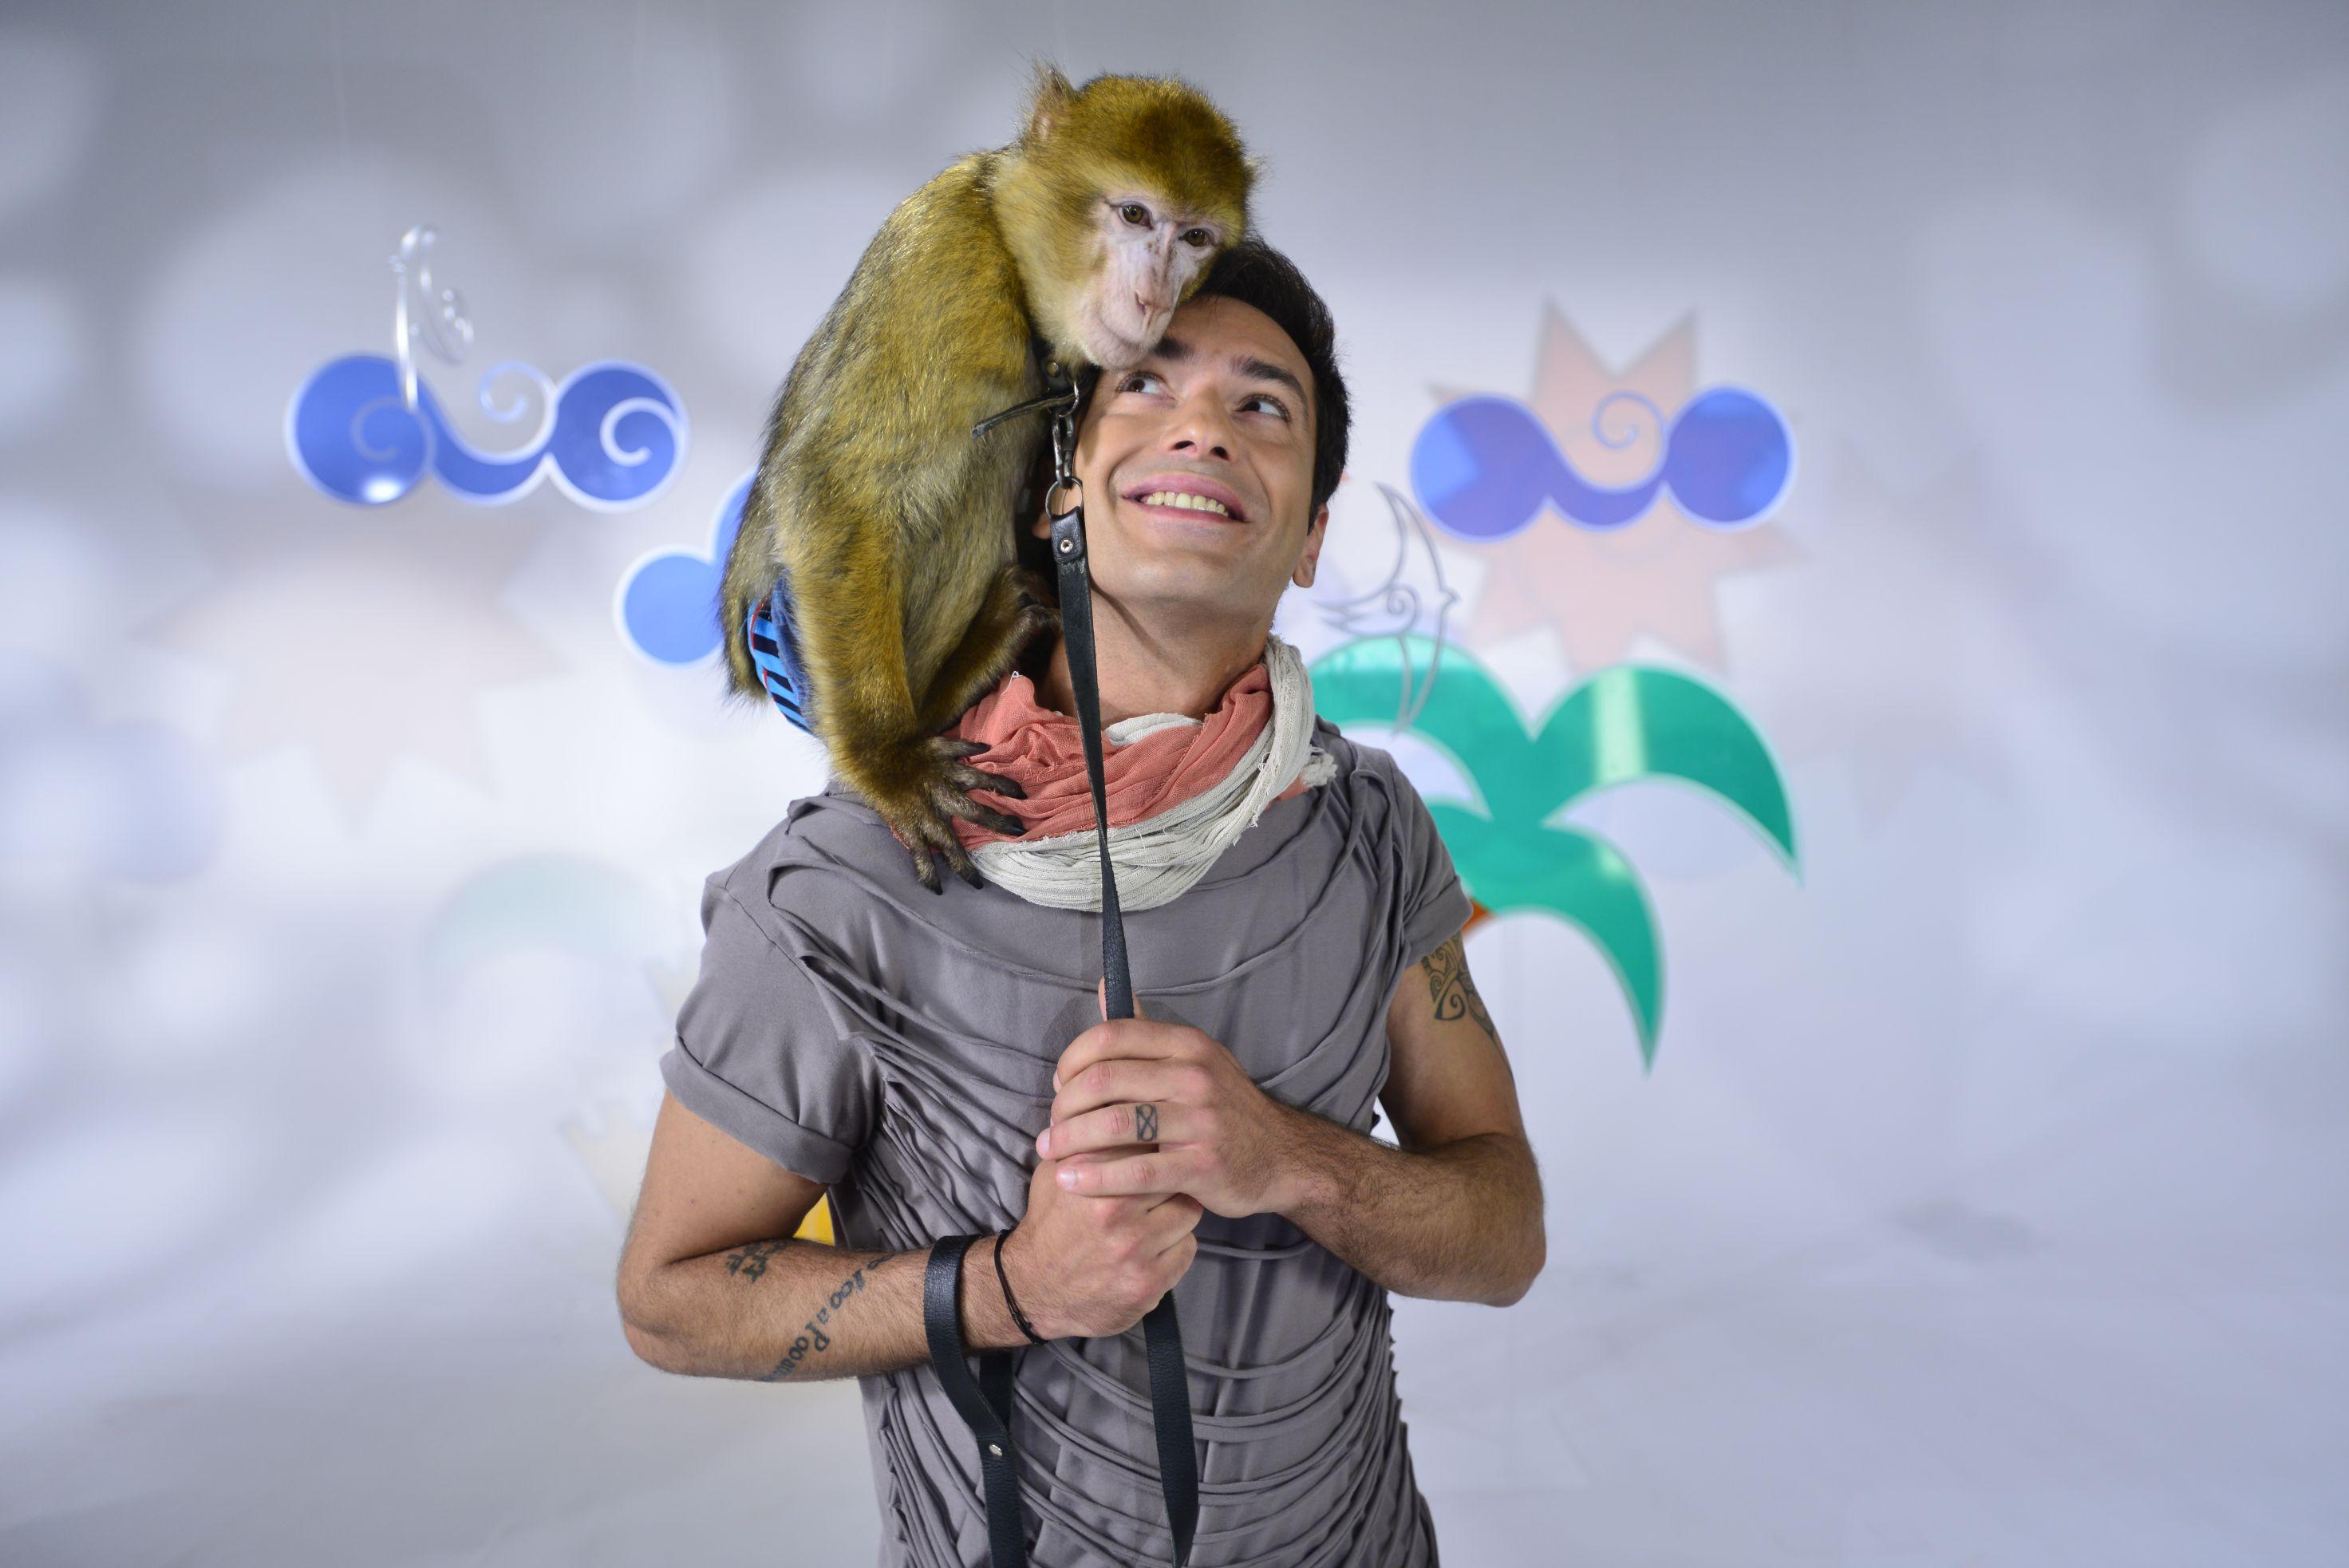 radu valcan - maimuta